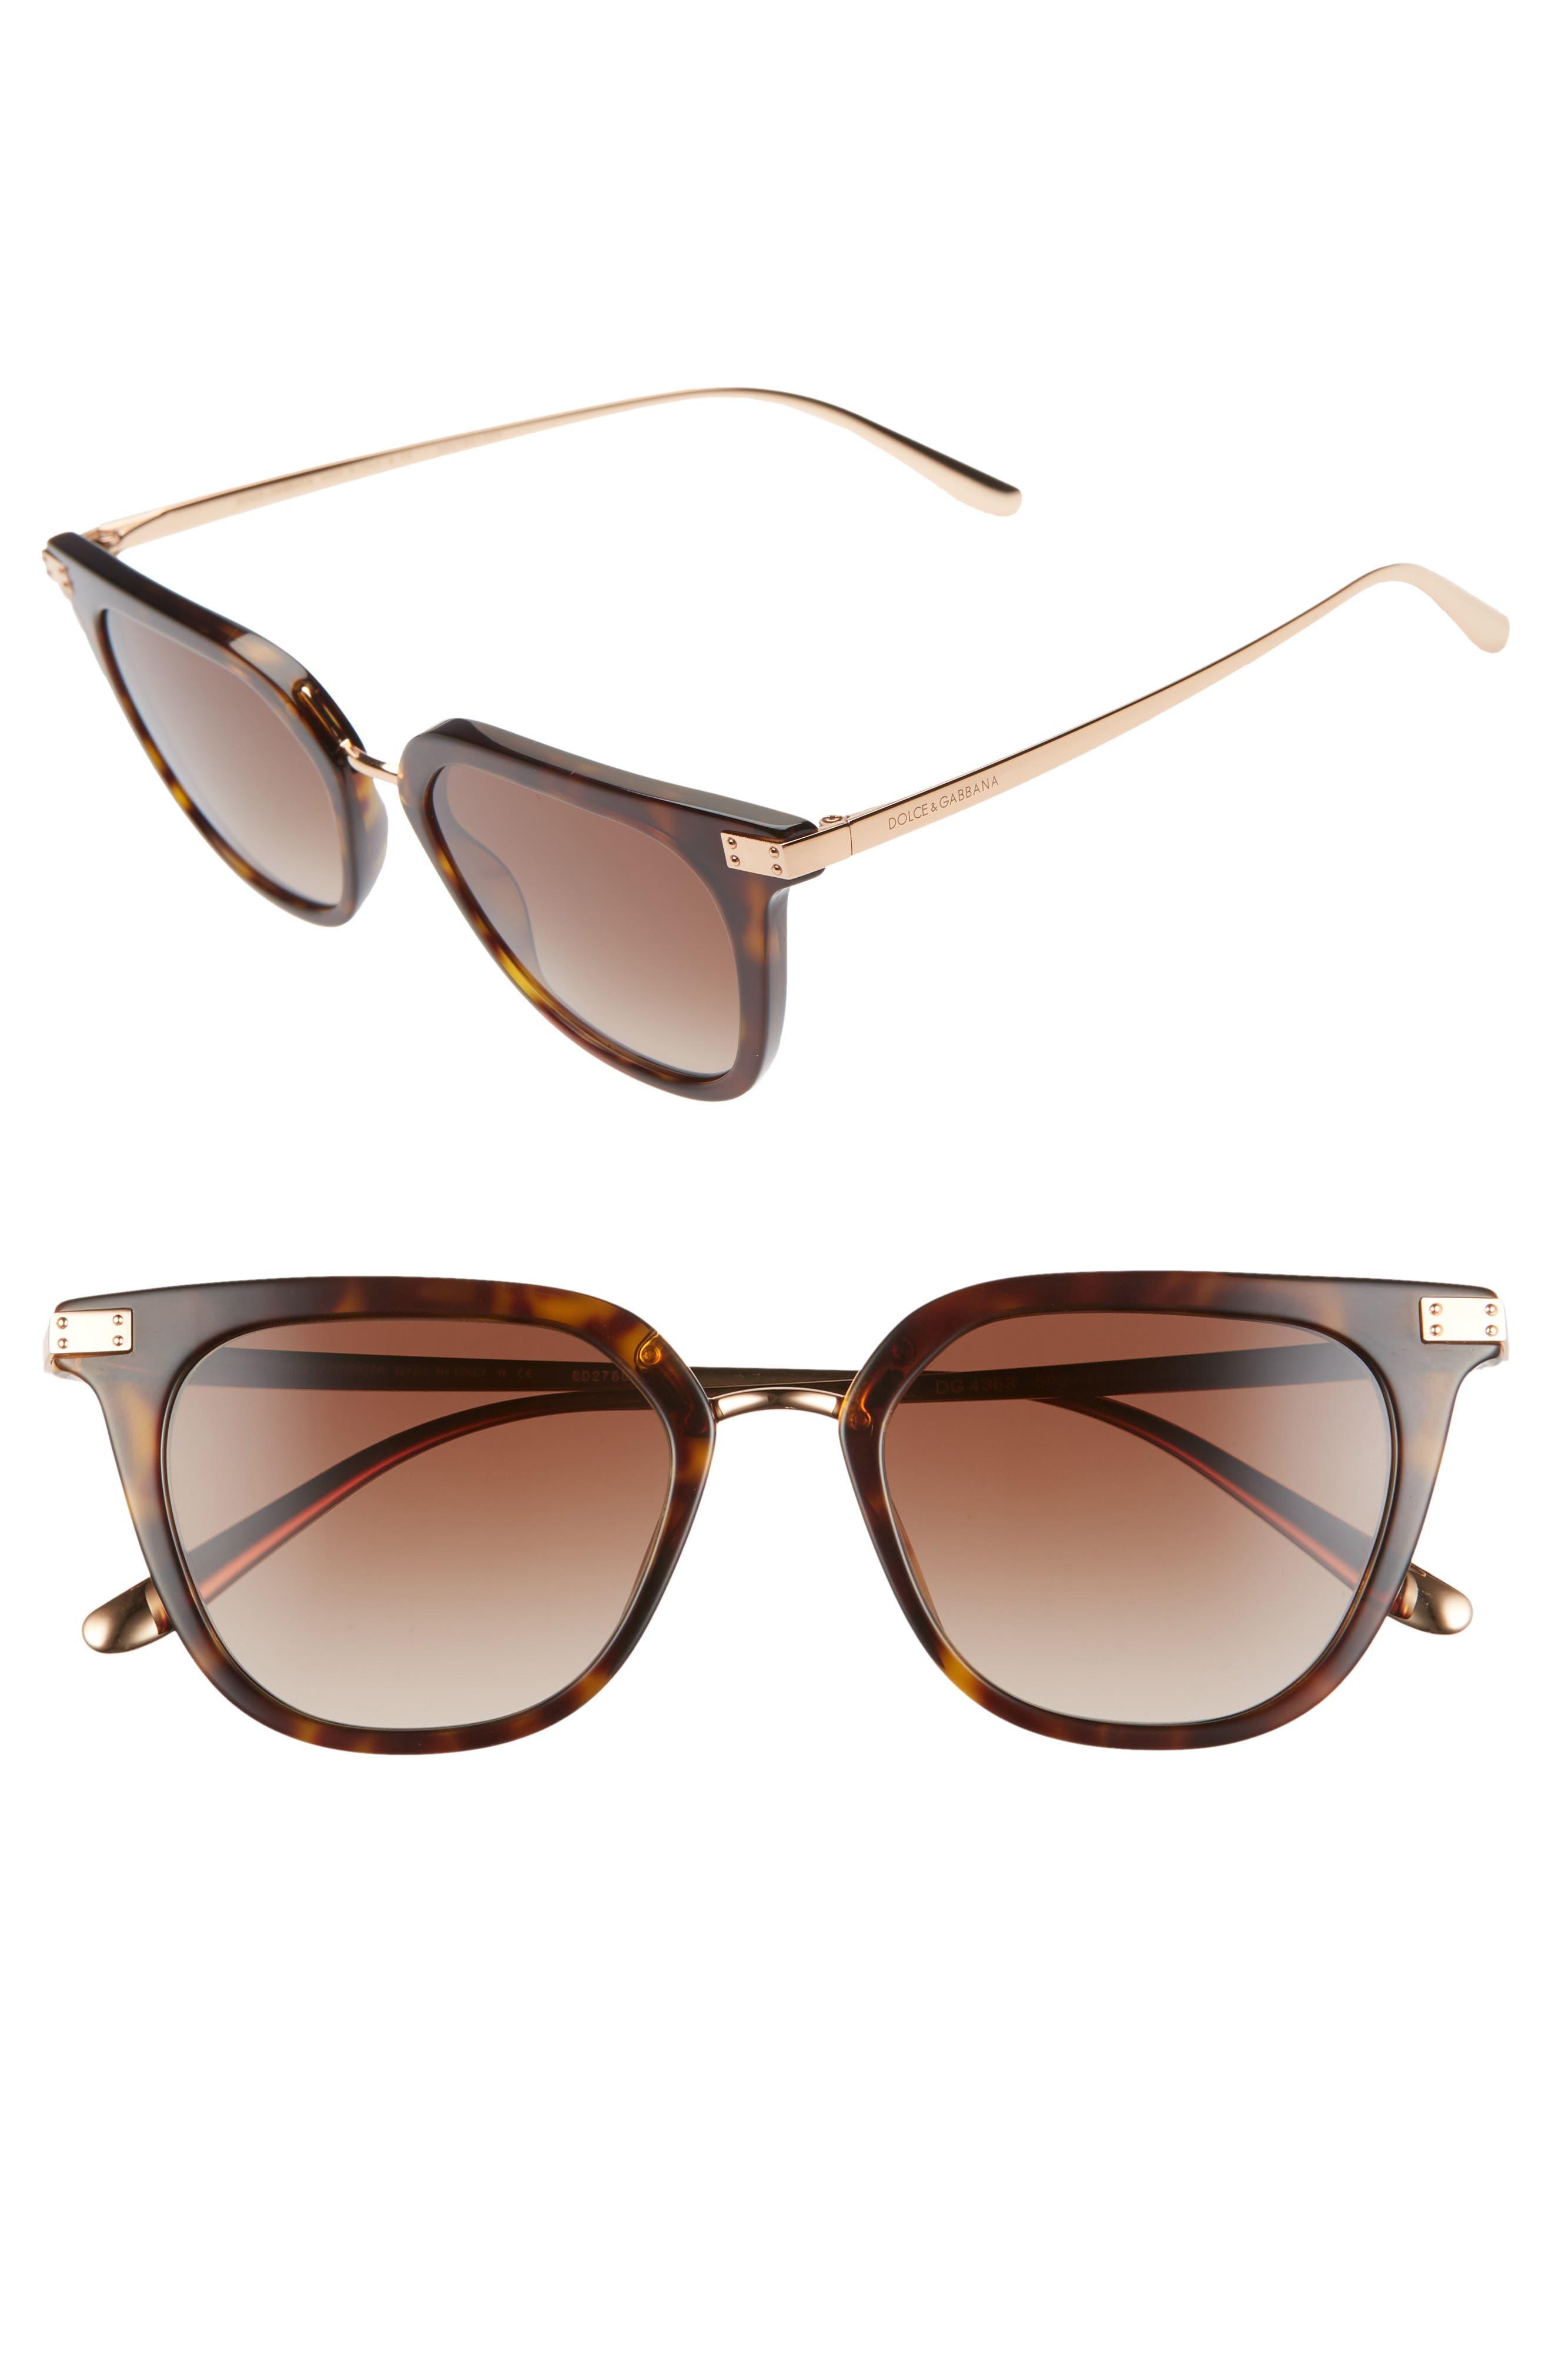 Dolce & gabbana 50Mm Sunglasses -